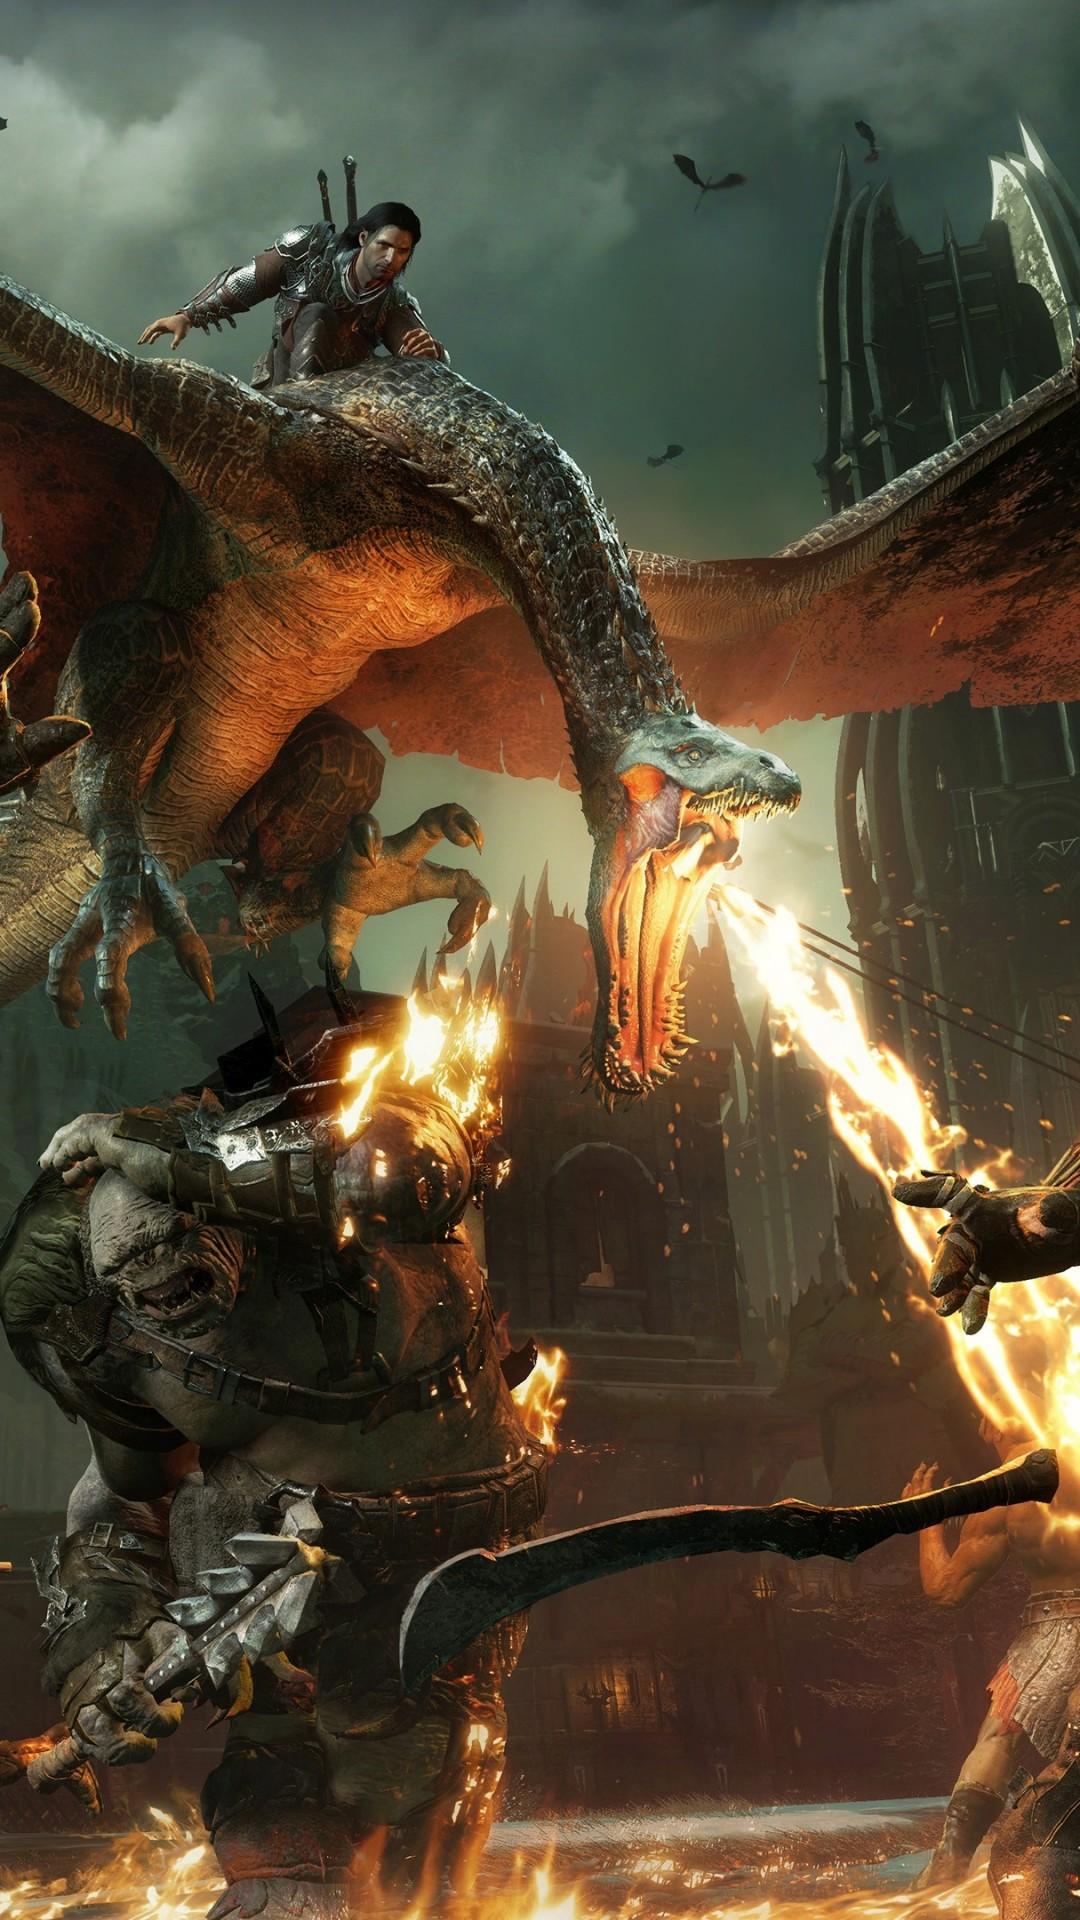 Wallpaper Middle-earth: Shadow of War, 4k, E3 2017